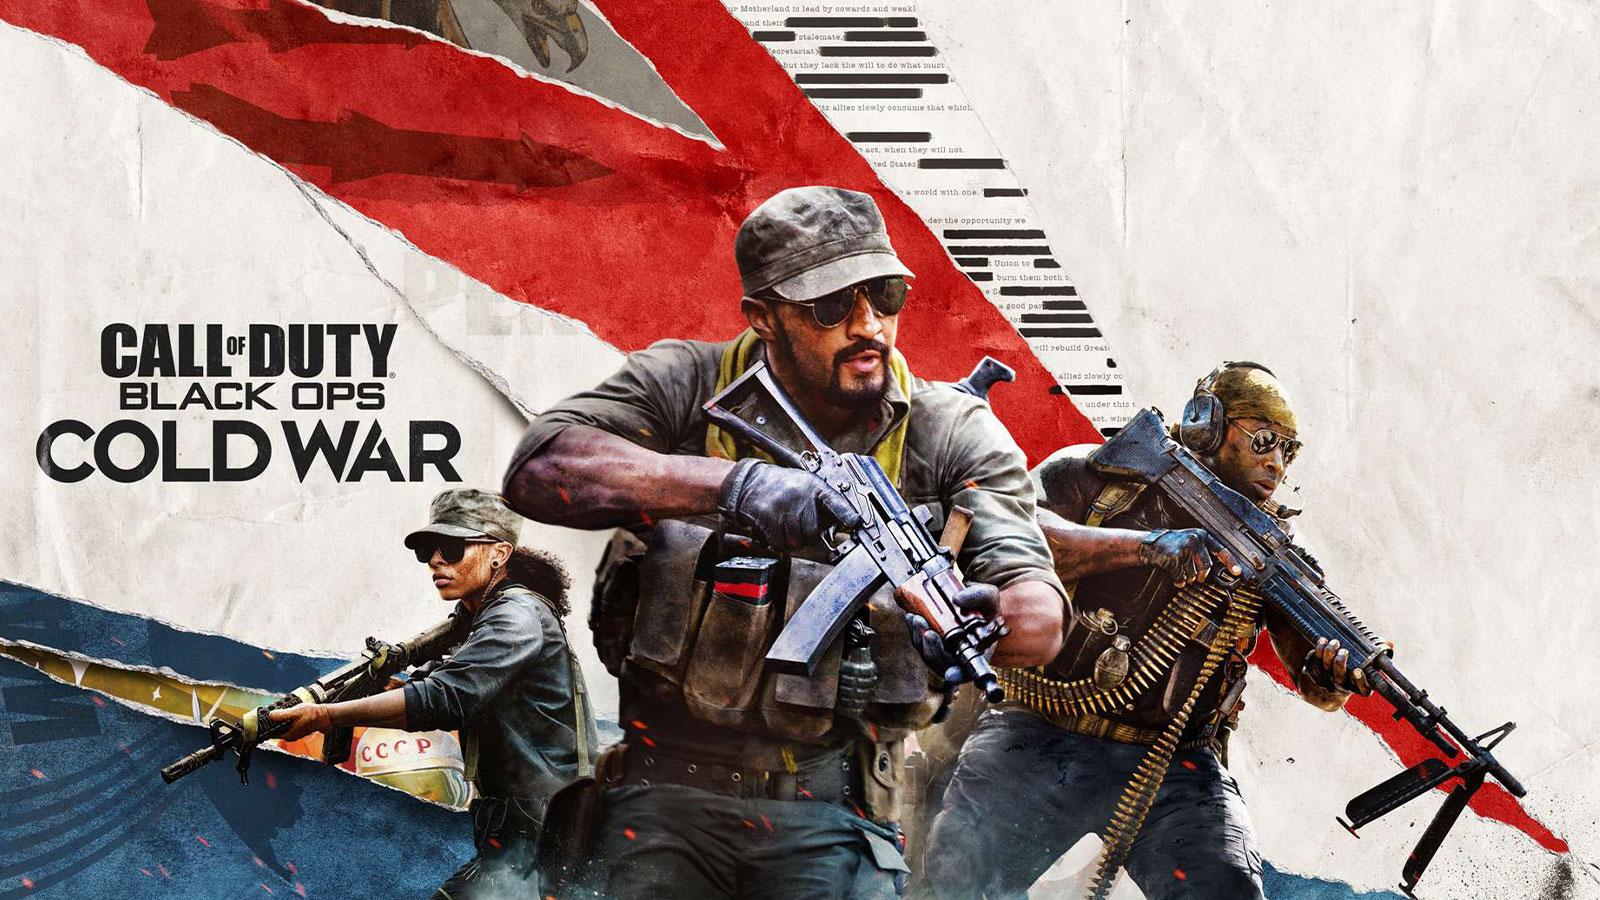 Image de Call of Duty Black Ops Cold WAR